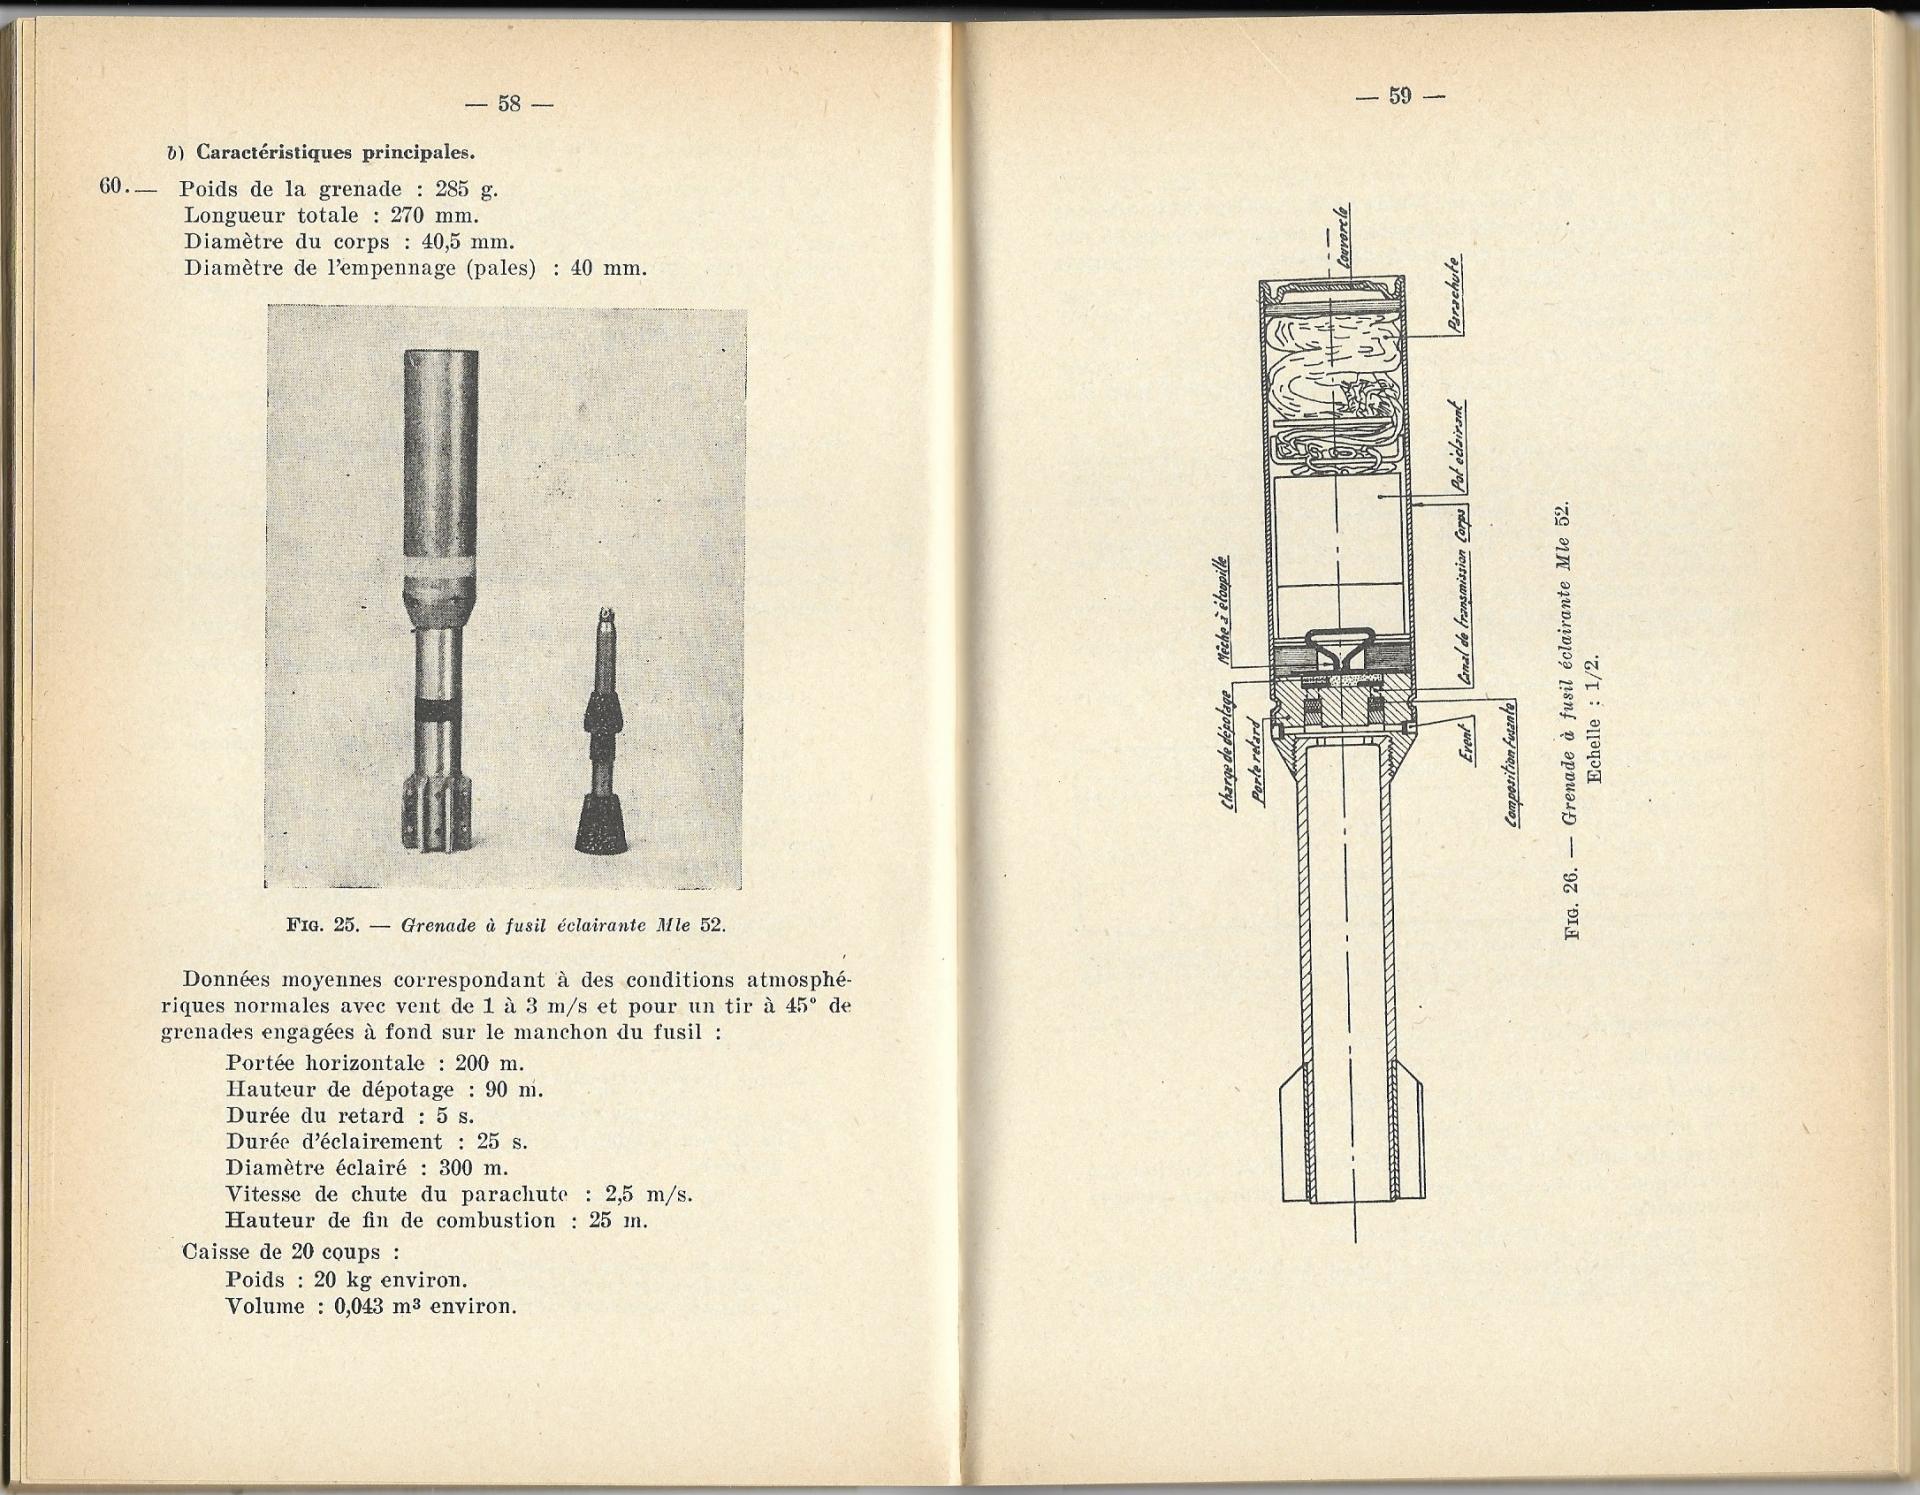 Grenades a fusil 1957 p58 59 b